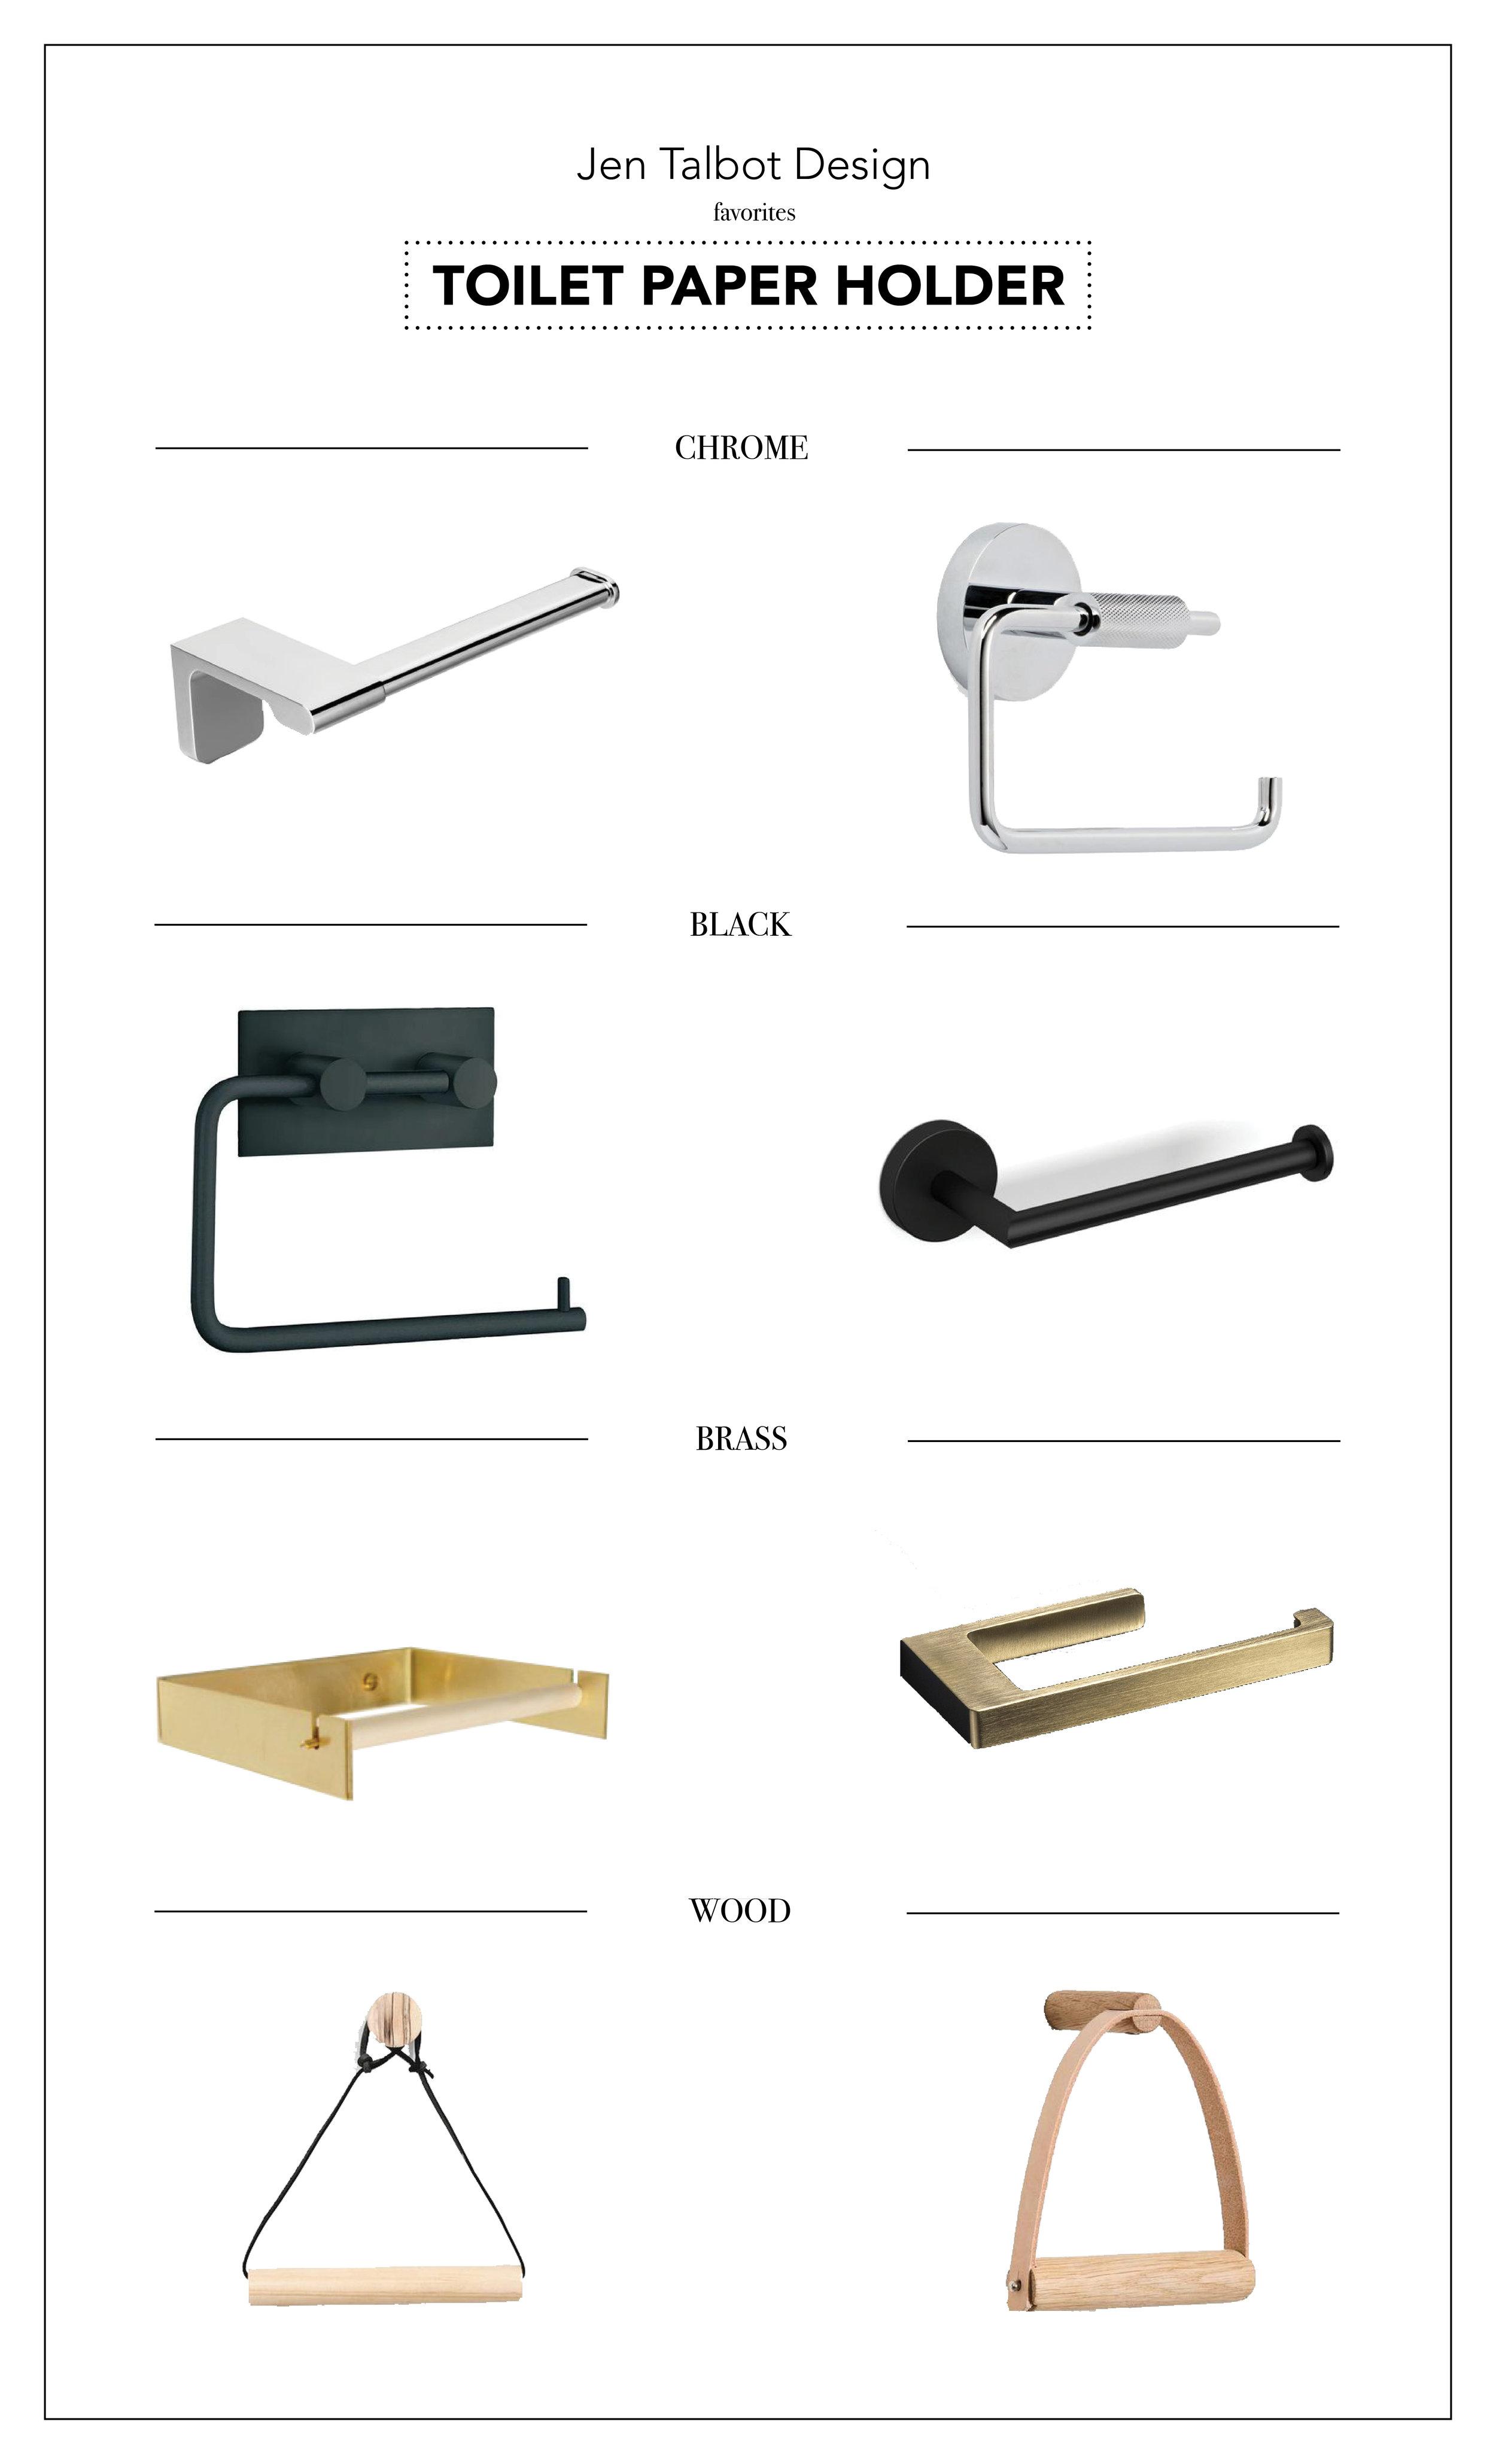 Design Details- Toilet Paper Holder - JTD.jpg